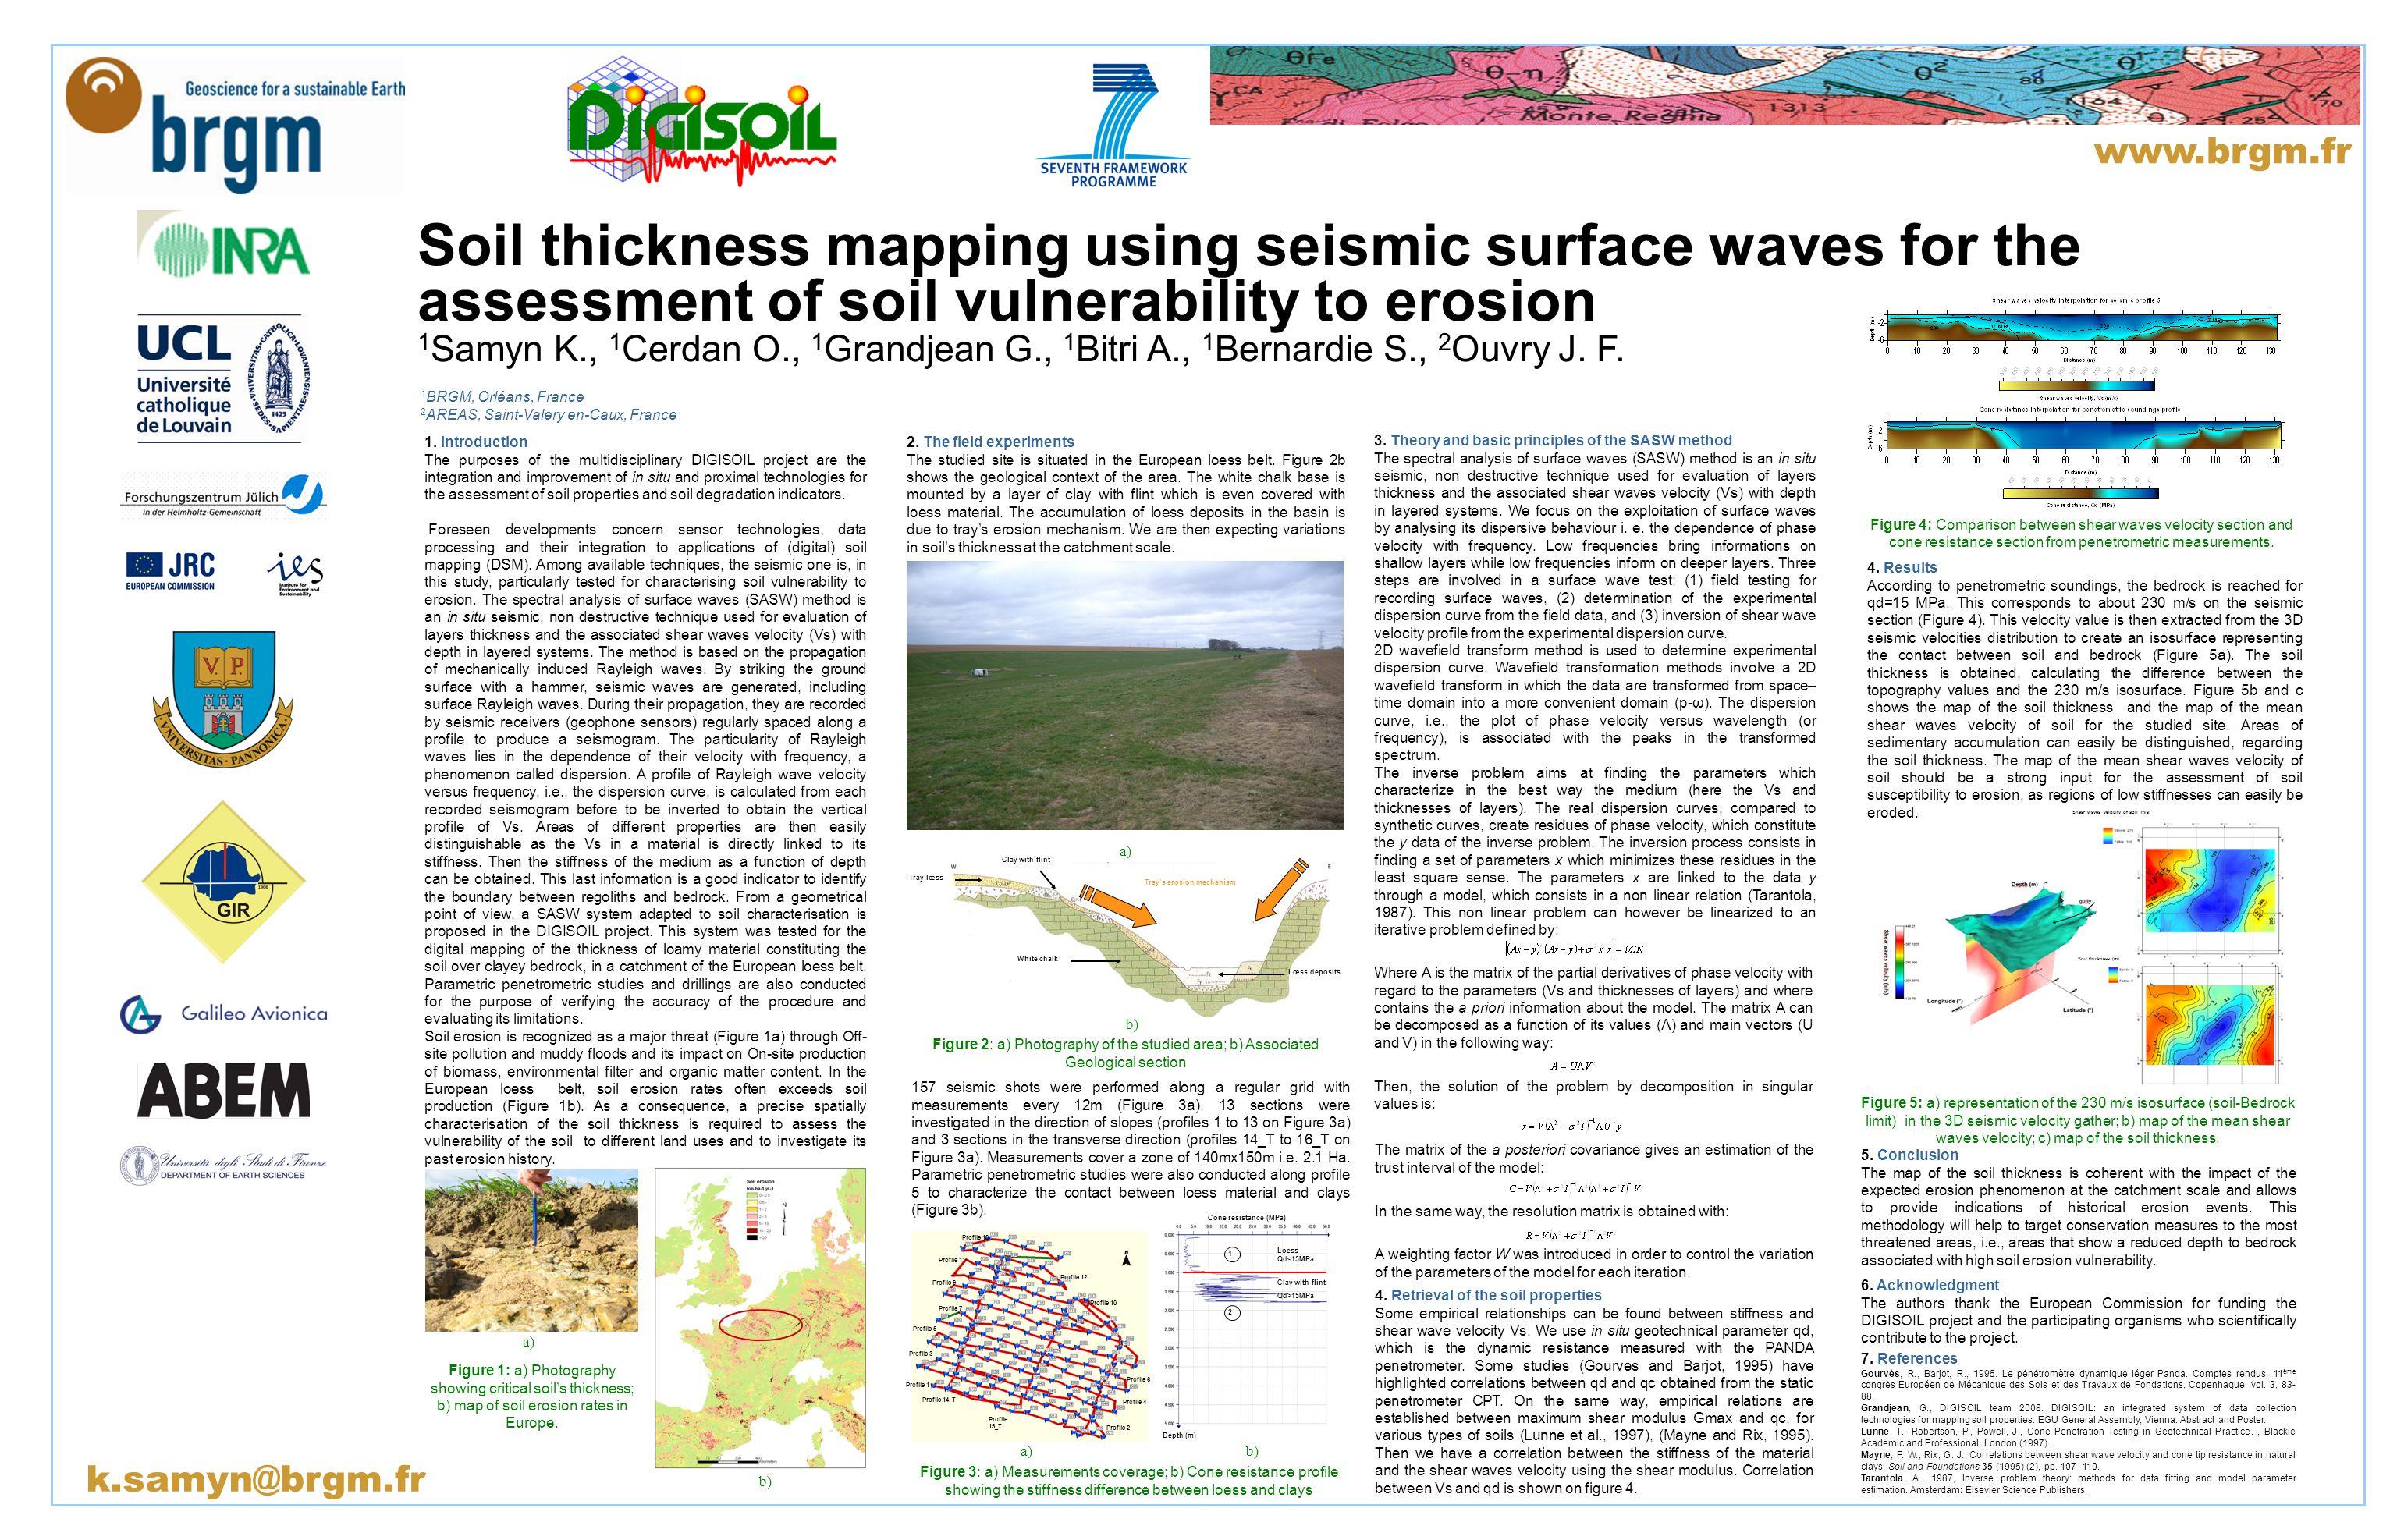 Soil thickness mapping using seismic surface waves for the assessment of soil vulnerability to erosion 1 Samyn K., 1 Cerdan O., 1 Grandjean G., 1 Bitri A., 1 Bernardie S., 2 Ouvry J.